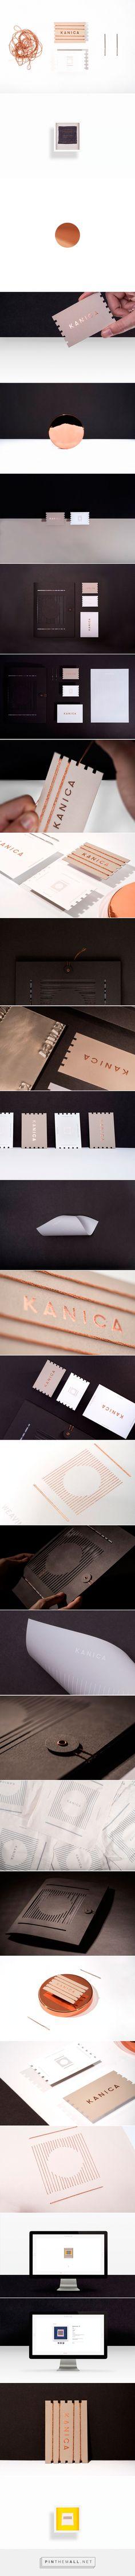 Kanica, una identidad hilada en cobre - created via http://pinthemall.net